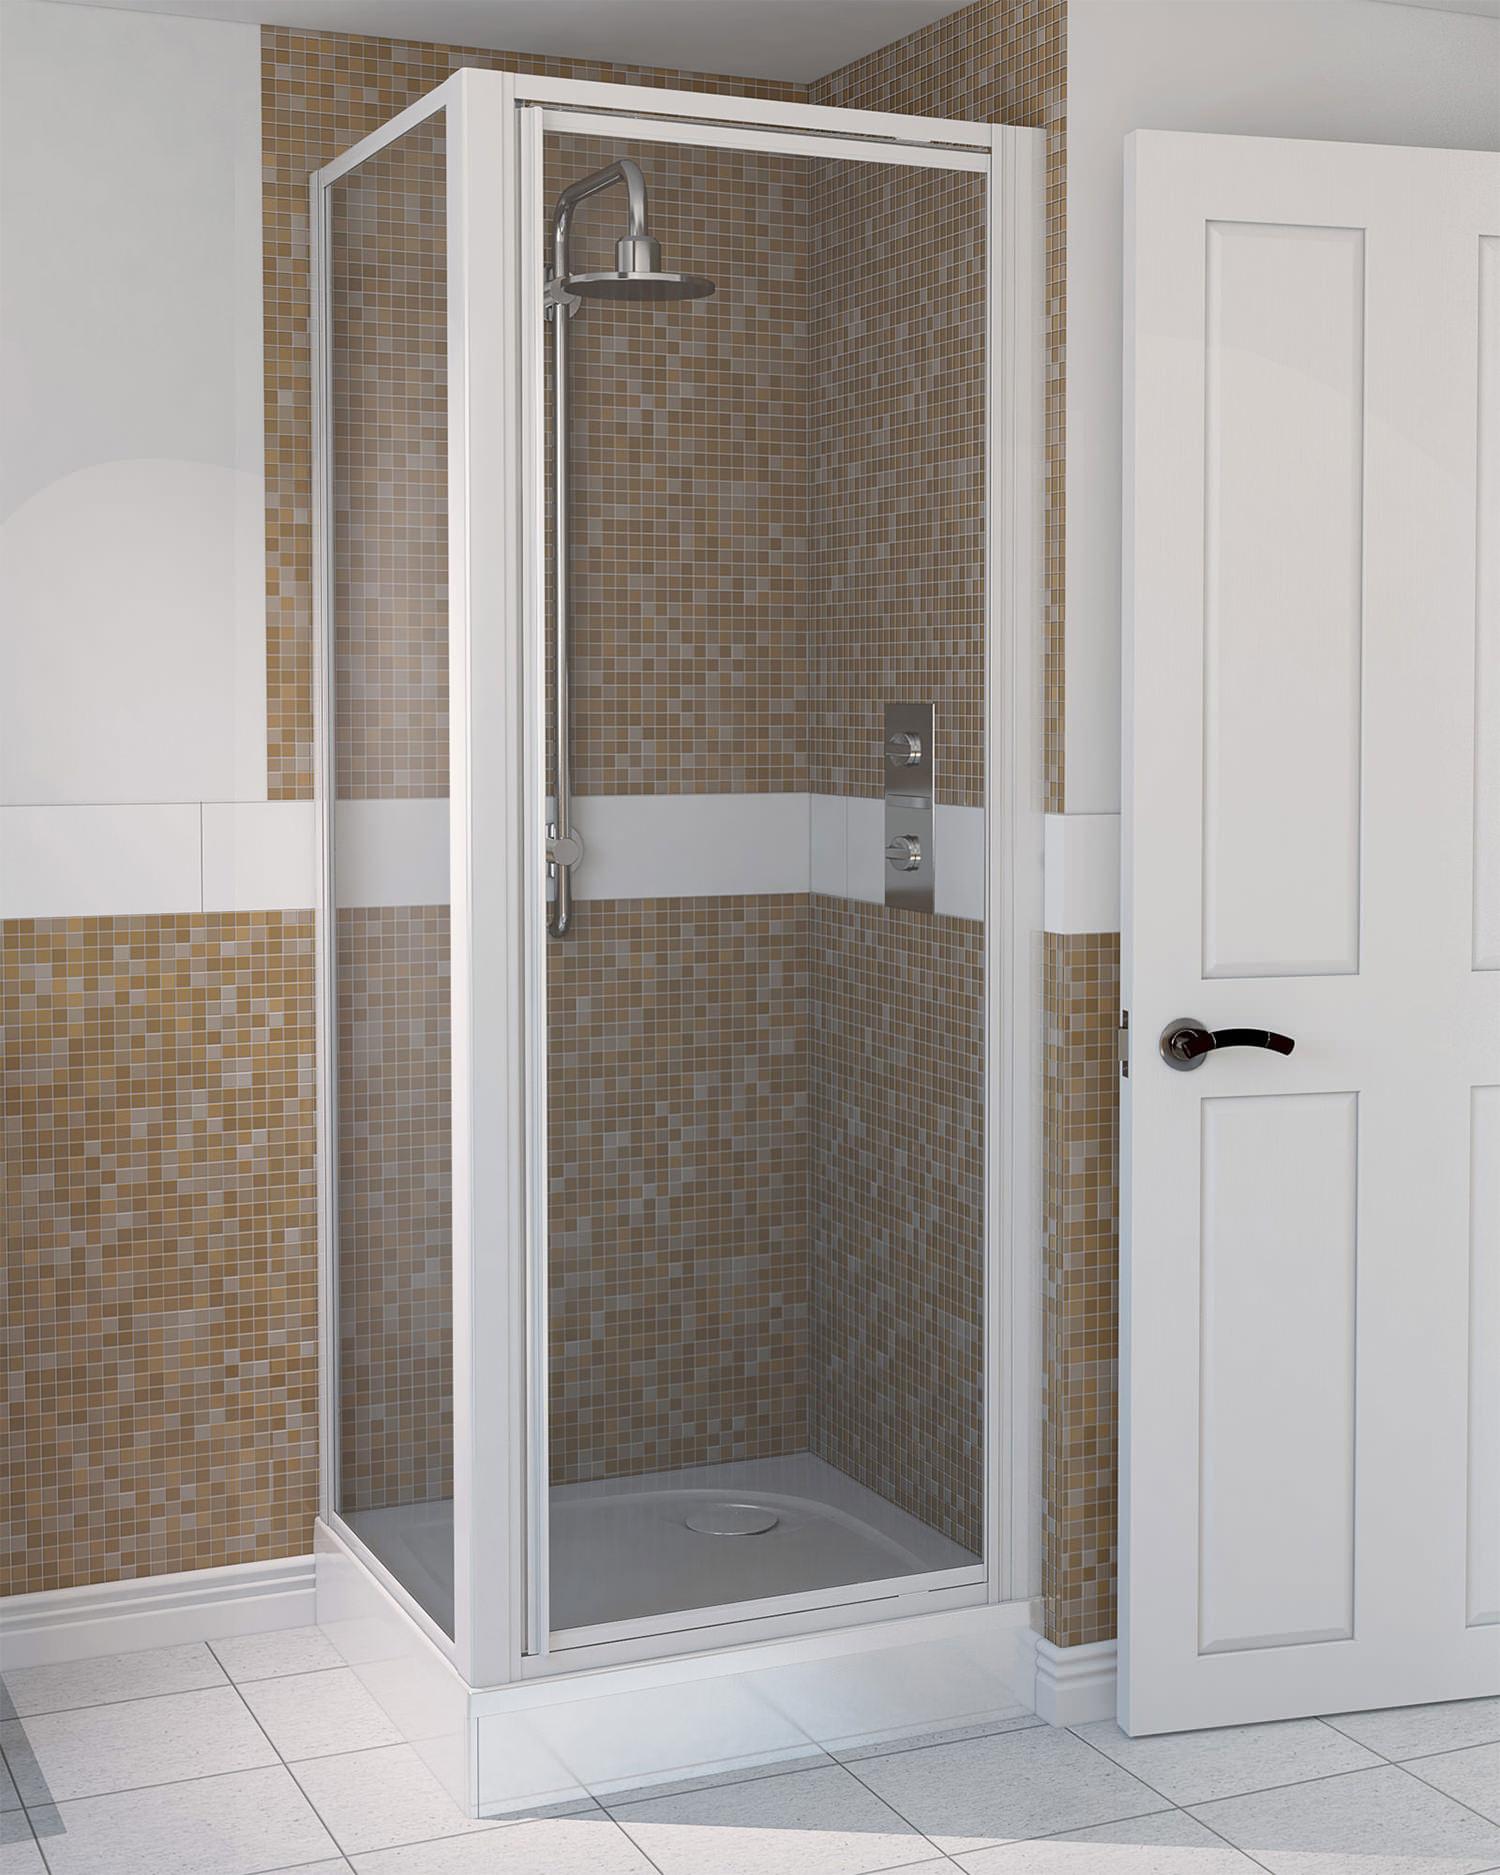 Aqualux Aqua 4 800 X 800mm Pivot Door And Side Panel White